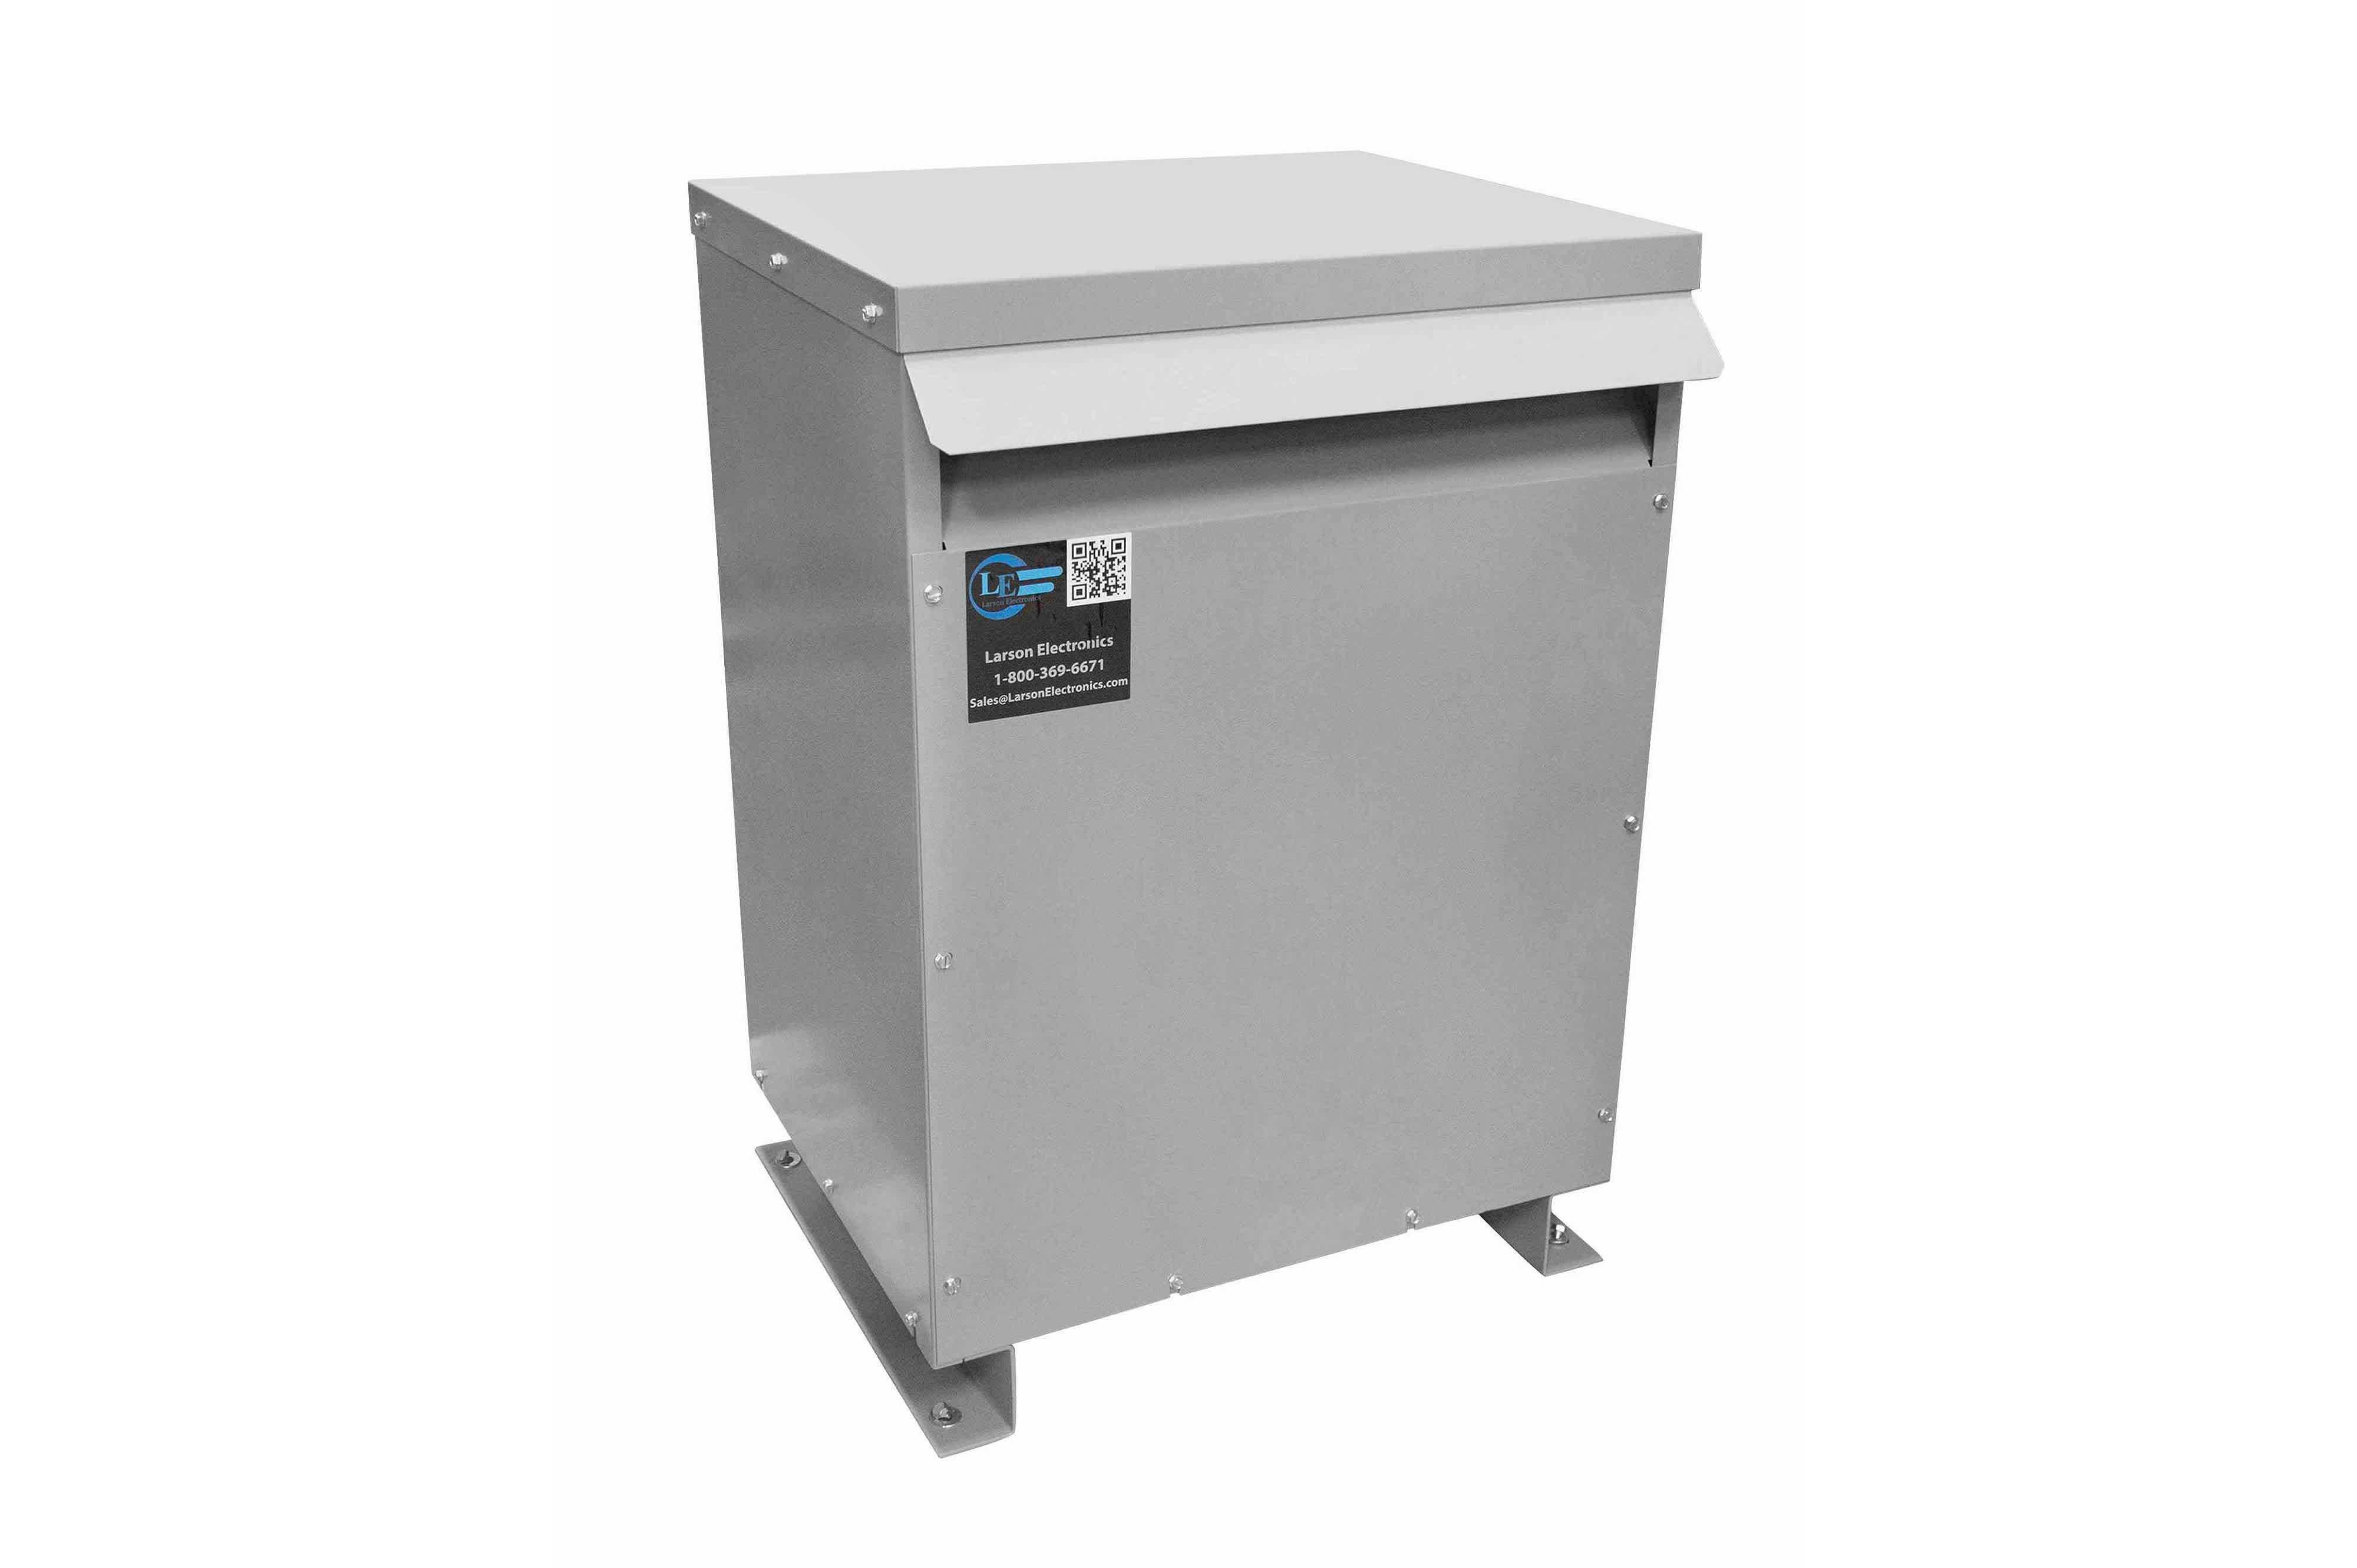 115 kVA 3PH Isolation Transformer, 460V Wye Primary, 240V/120 Delta Secondary, N3R, Ventilated, 60 Hz